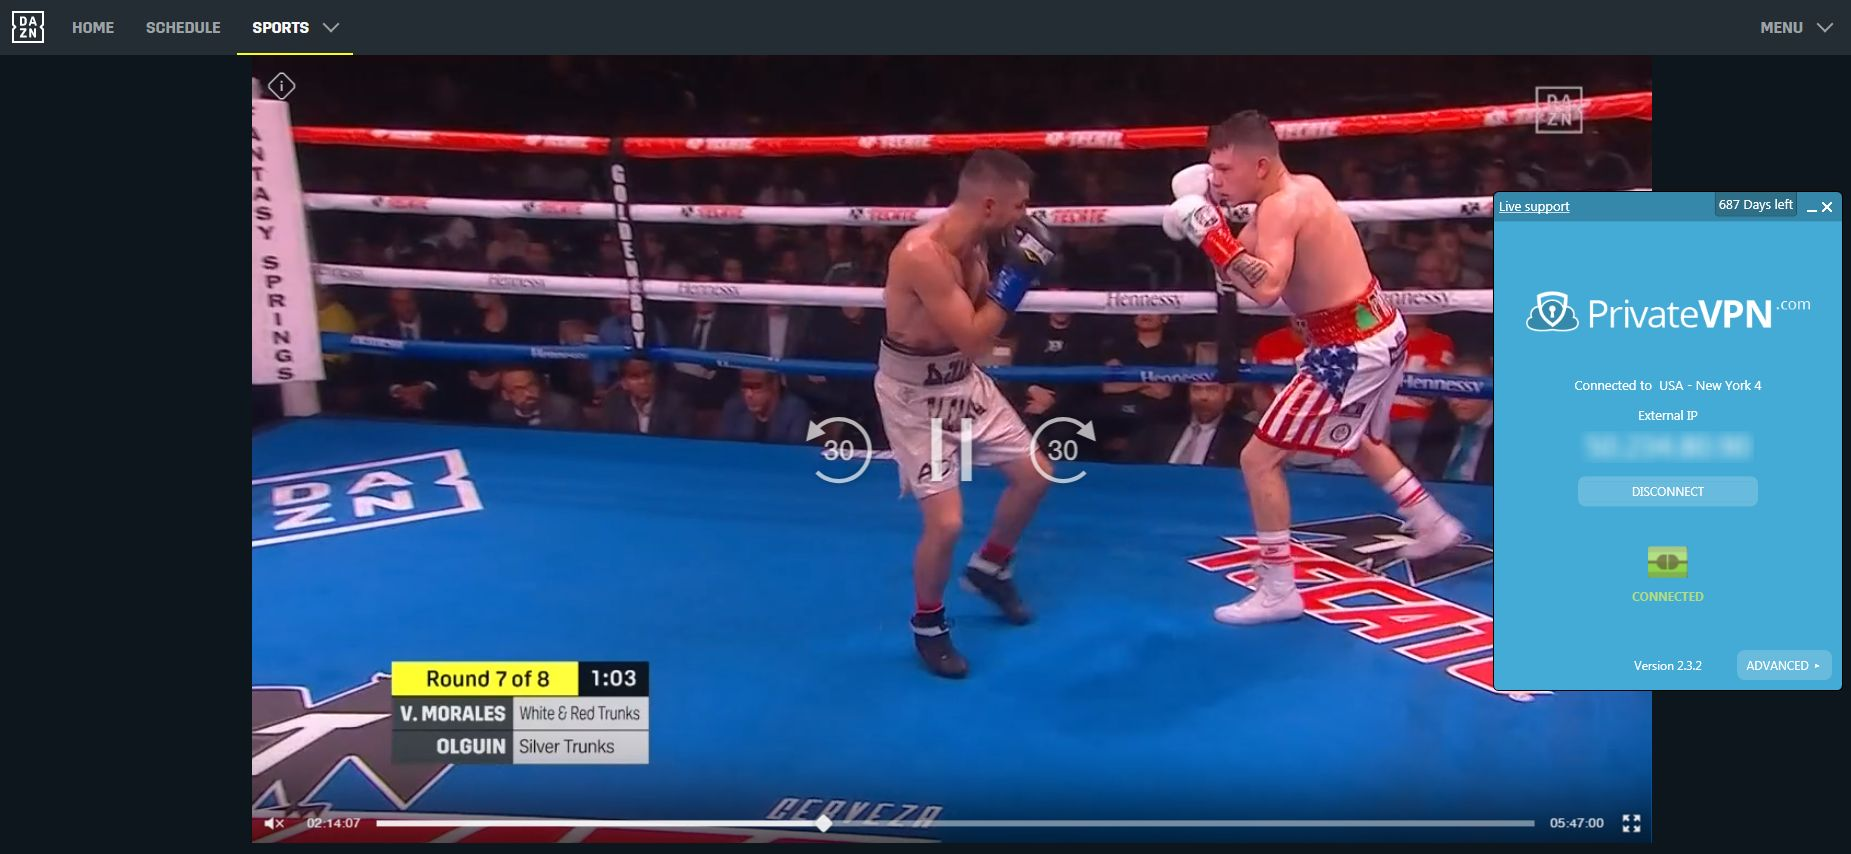 Screenshot des PrivateVPN-Streaming-Boxkampfes auf DAZN US